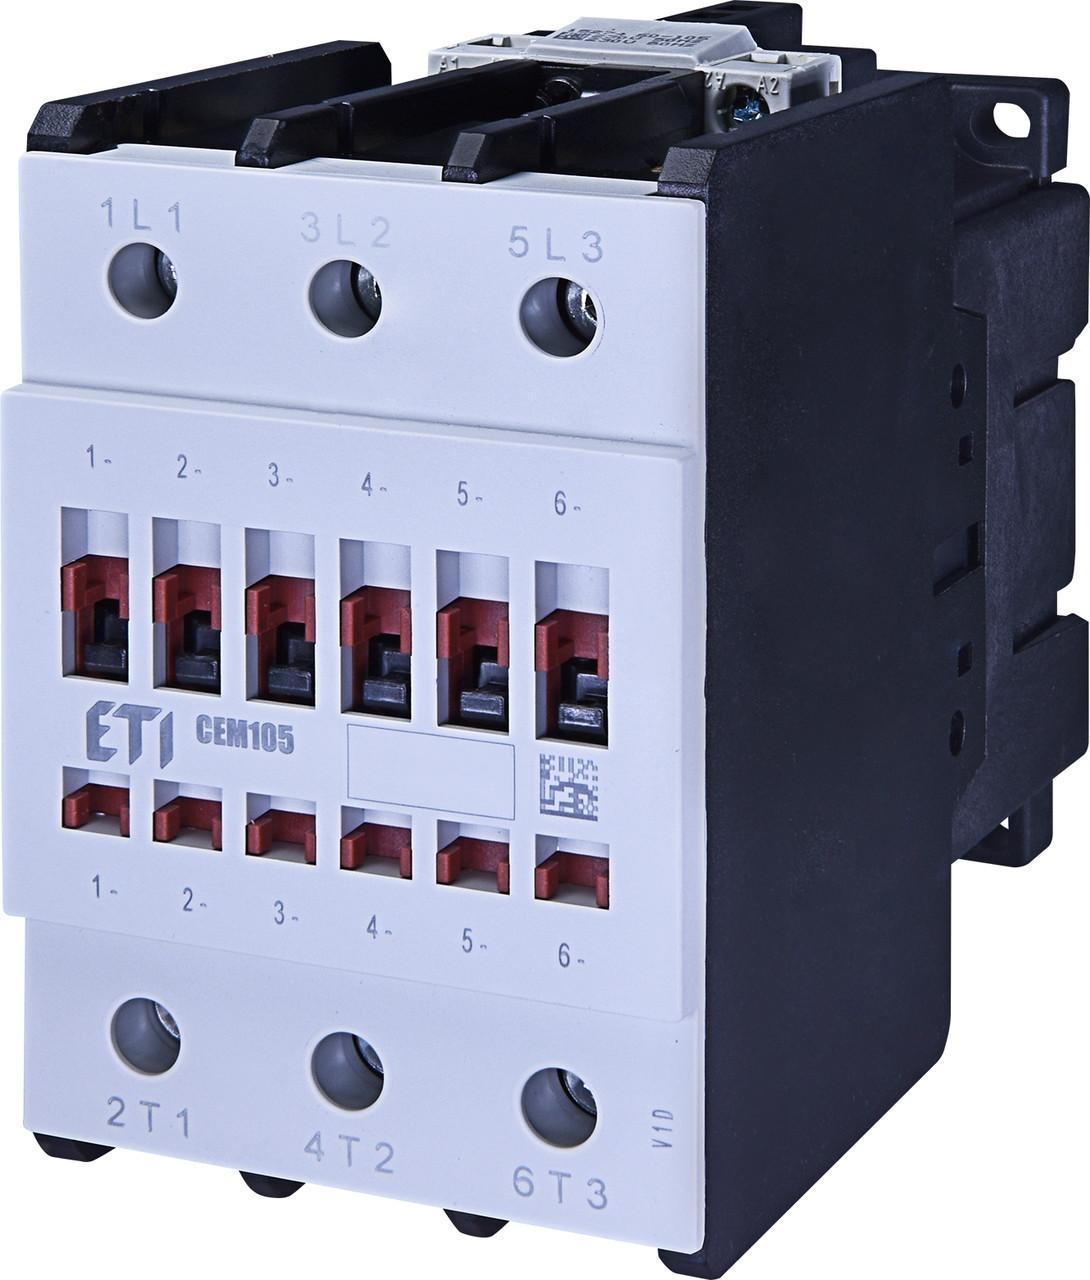 Контактор силовой ETI CEM 105.00 105А 230V AC 3NO 55kW 4652103 (на DIN-рейку, 140A AC1, 105A AC3)